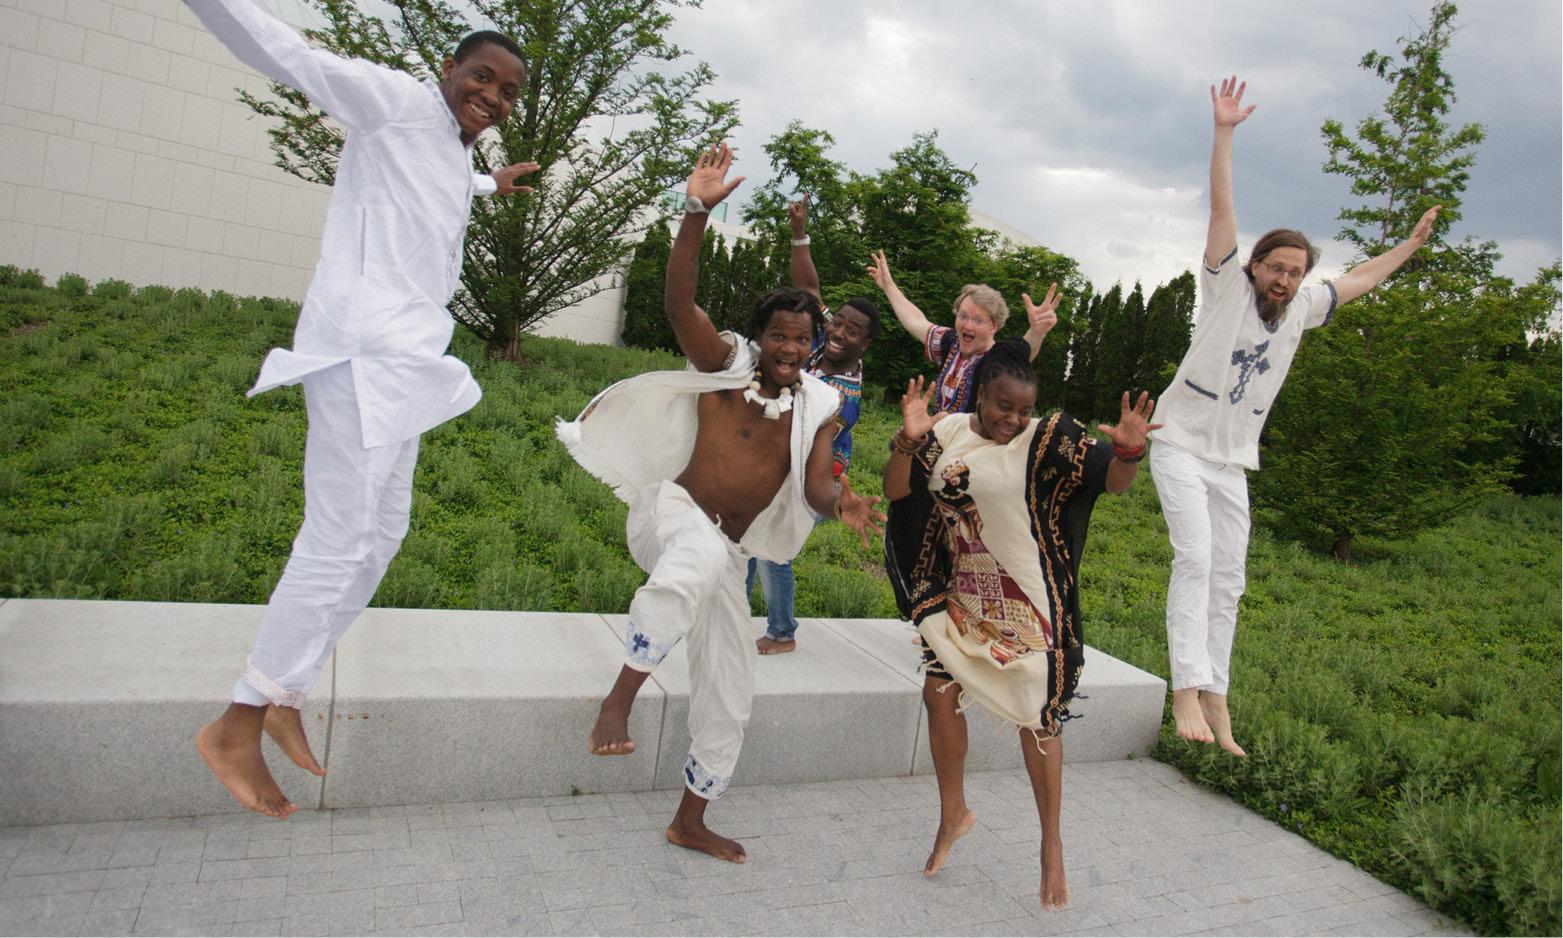 Edwards Summer Music Series: Nhapitapi & ZimSculpt Opening Night